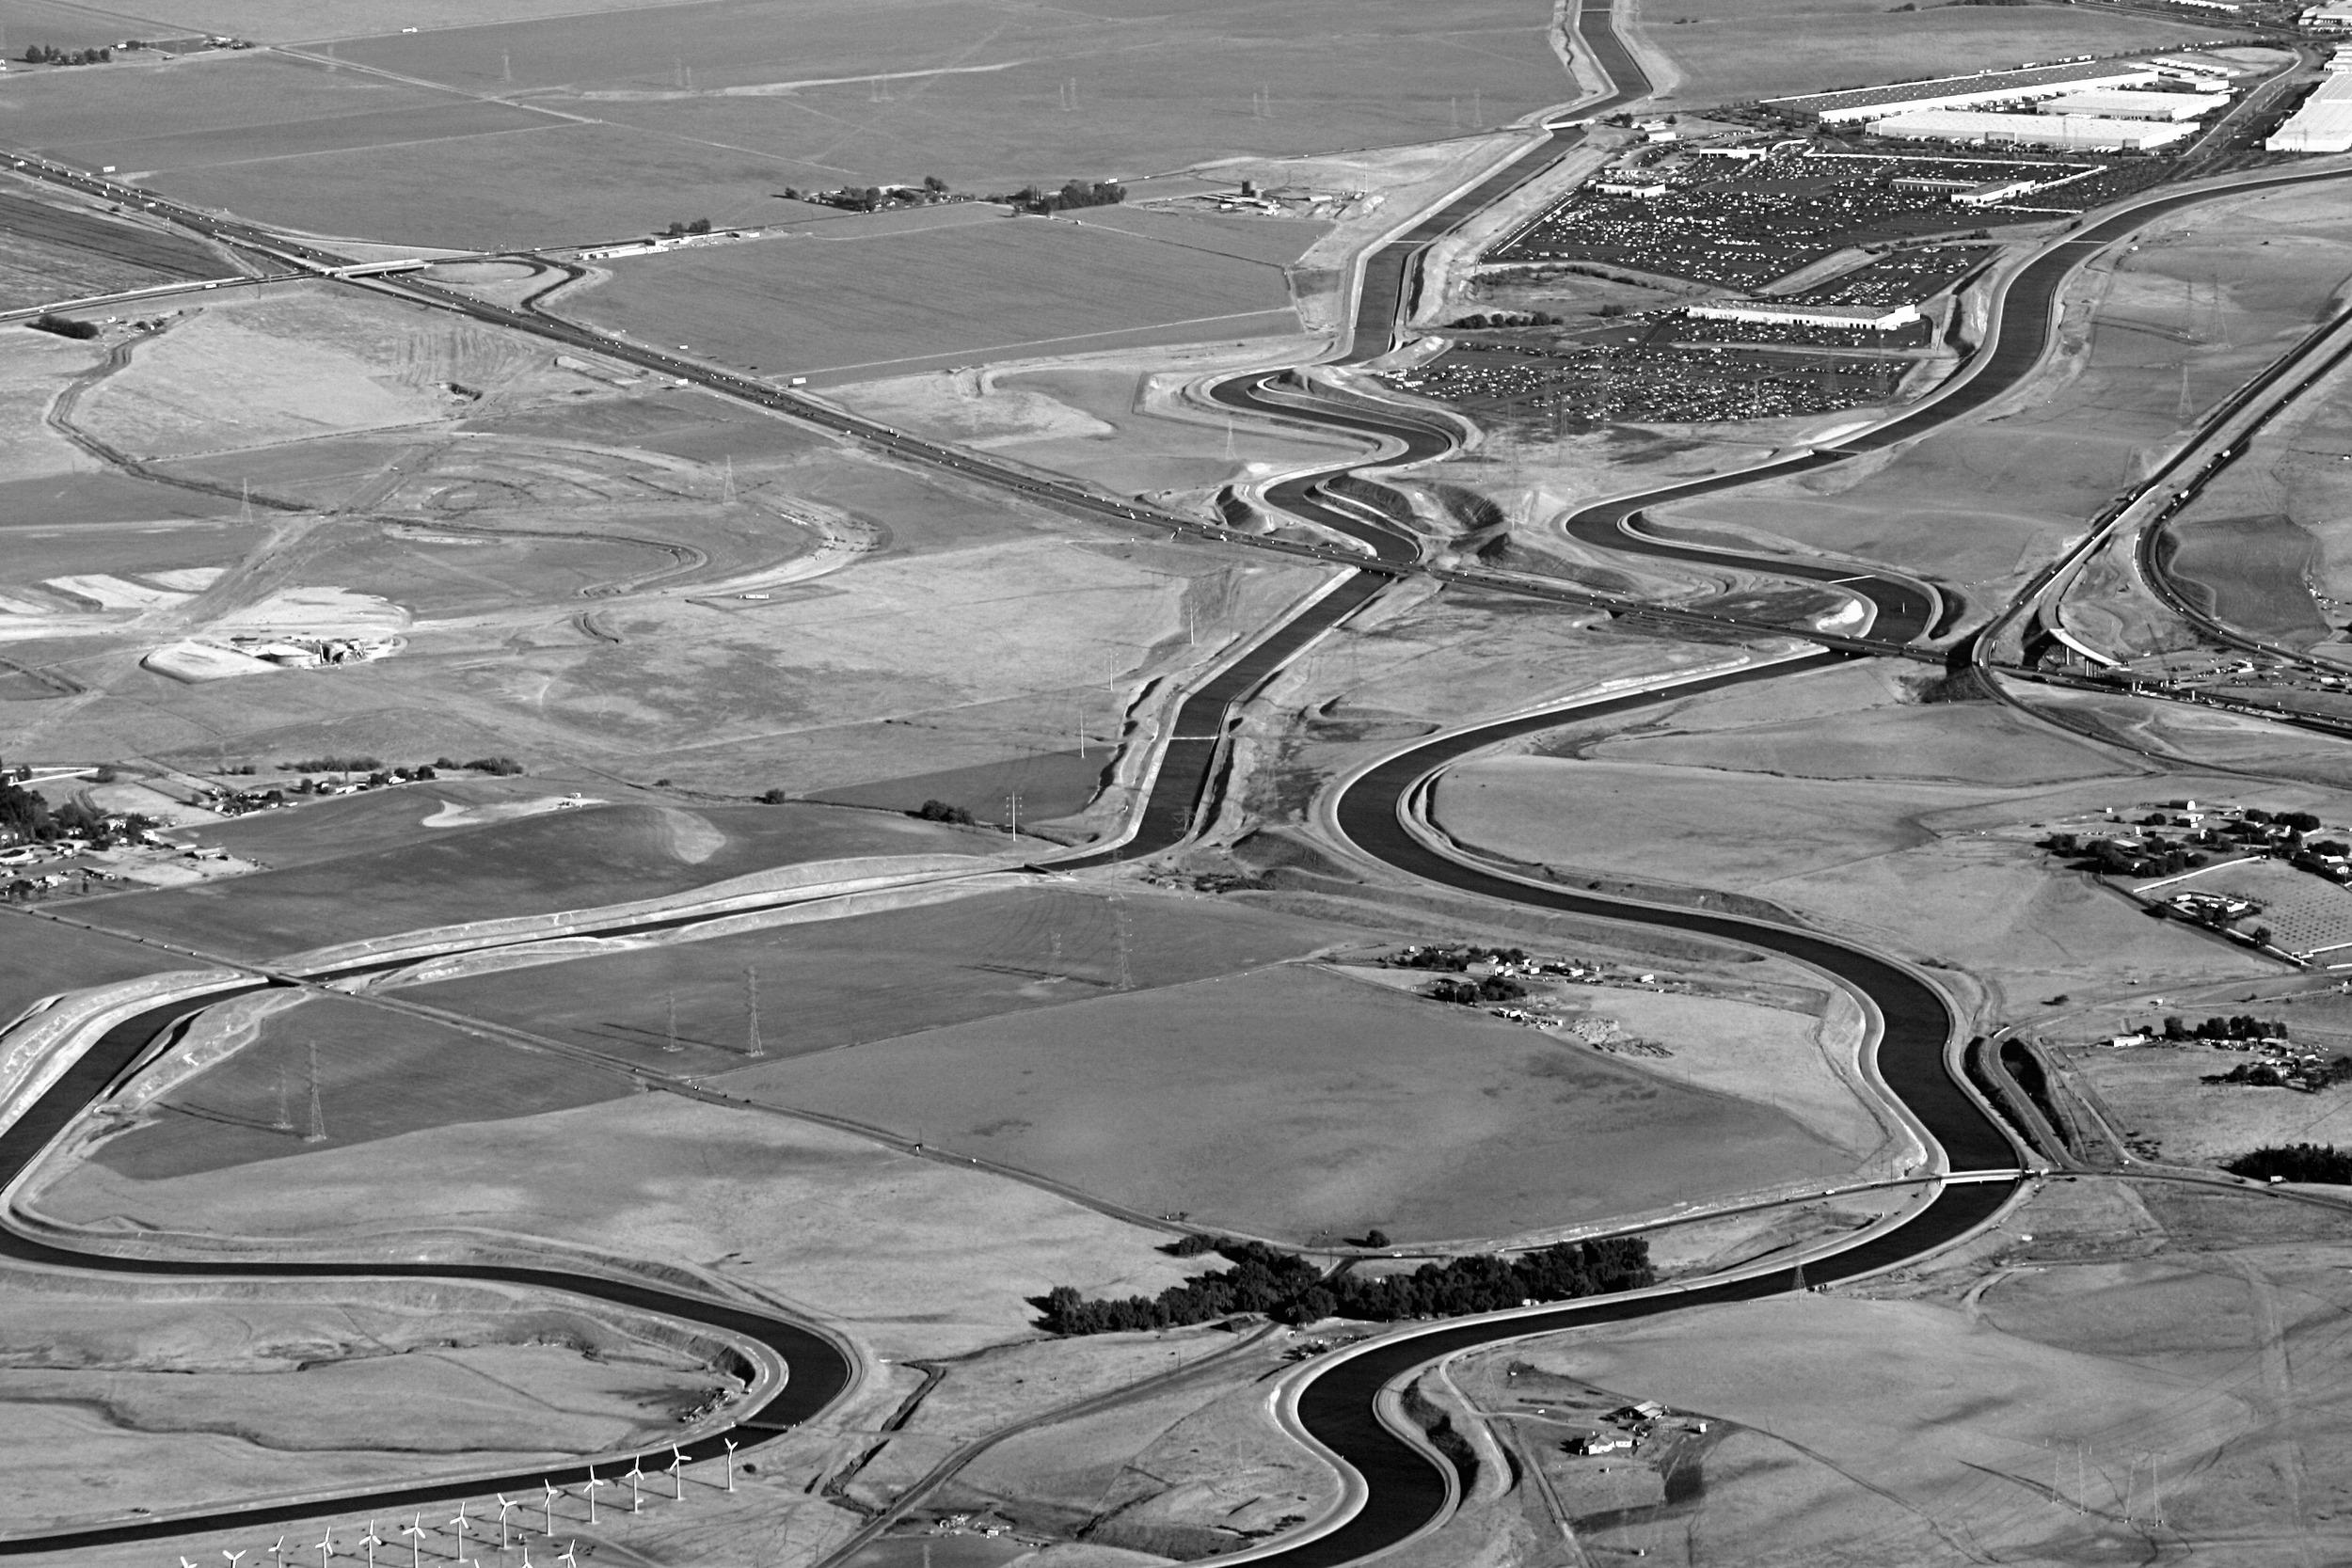 BWKluft-Photo-Aerial-I205-California-Aqueduct-Img_0038  commons.wikimedia.org.jpg